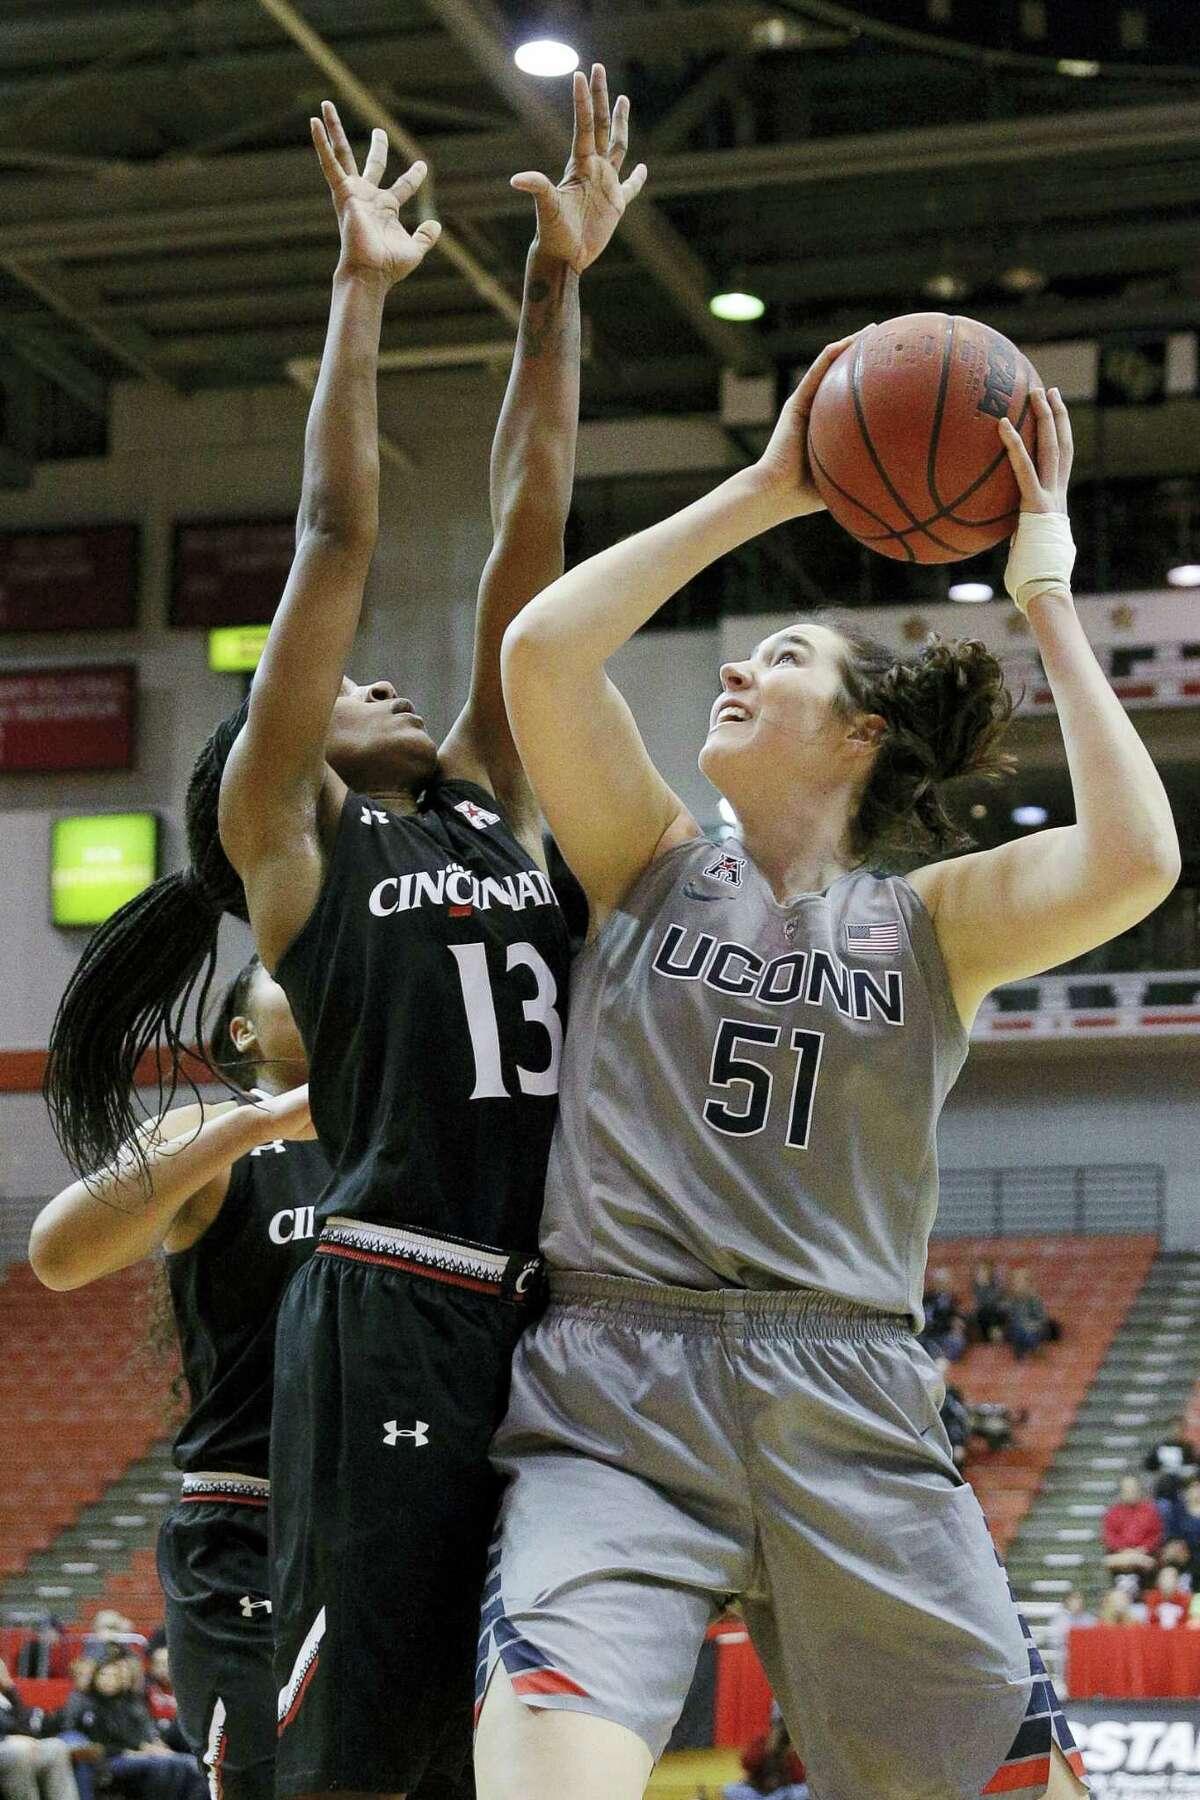 UConn's Natalie Butler had 11 points and eight rebounds in her UConn debut against Cincinnati on Dec. 30.